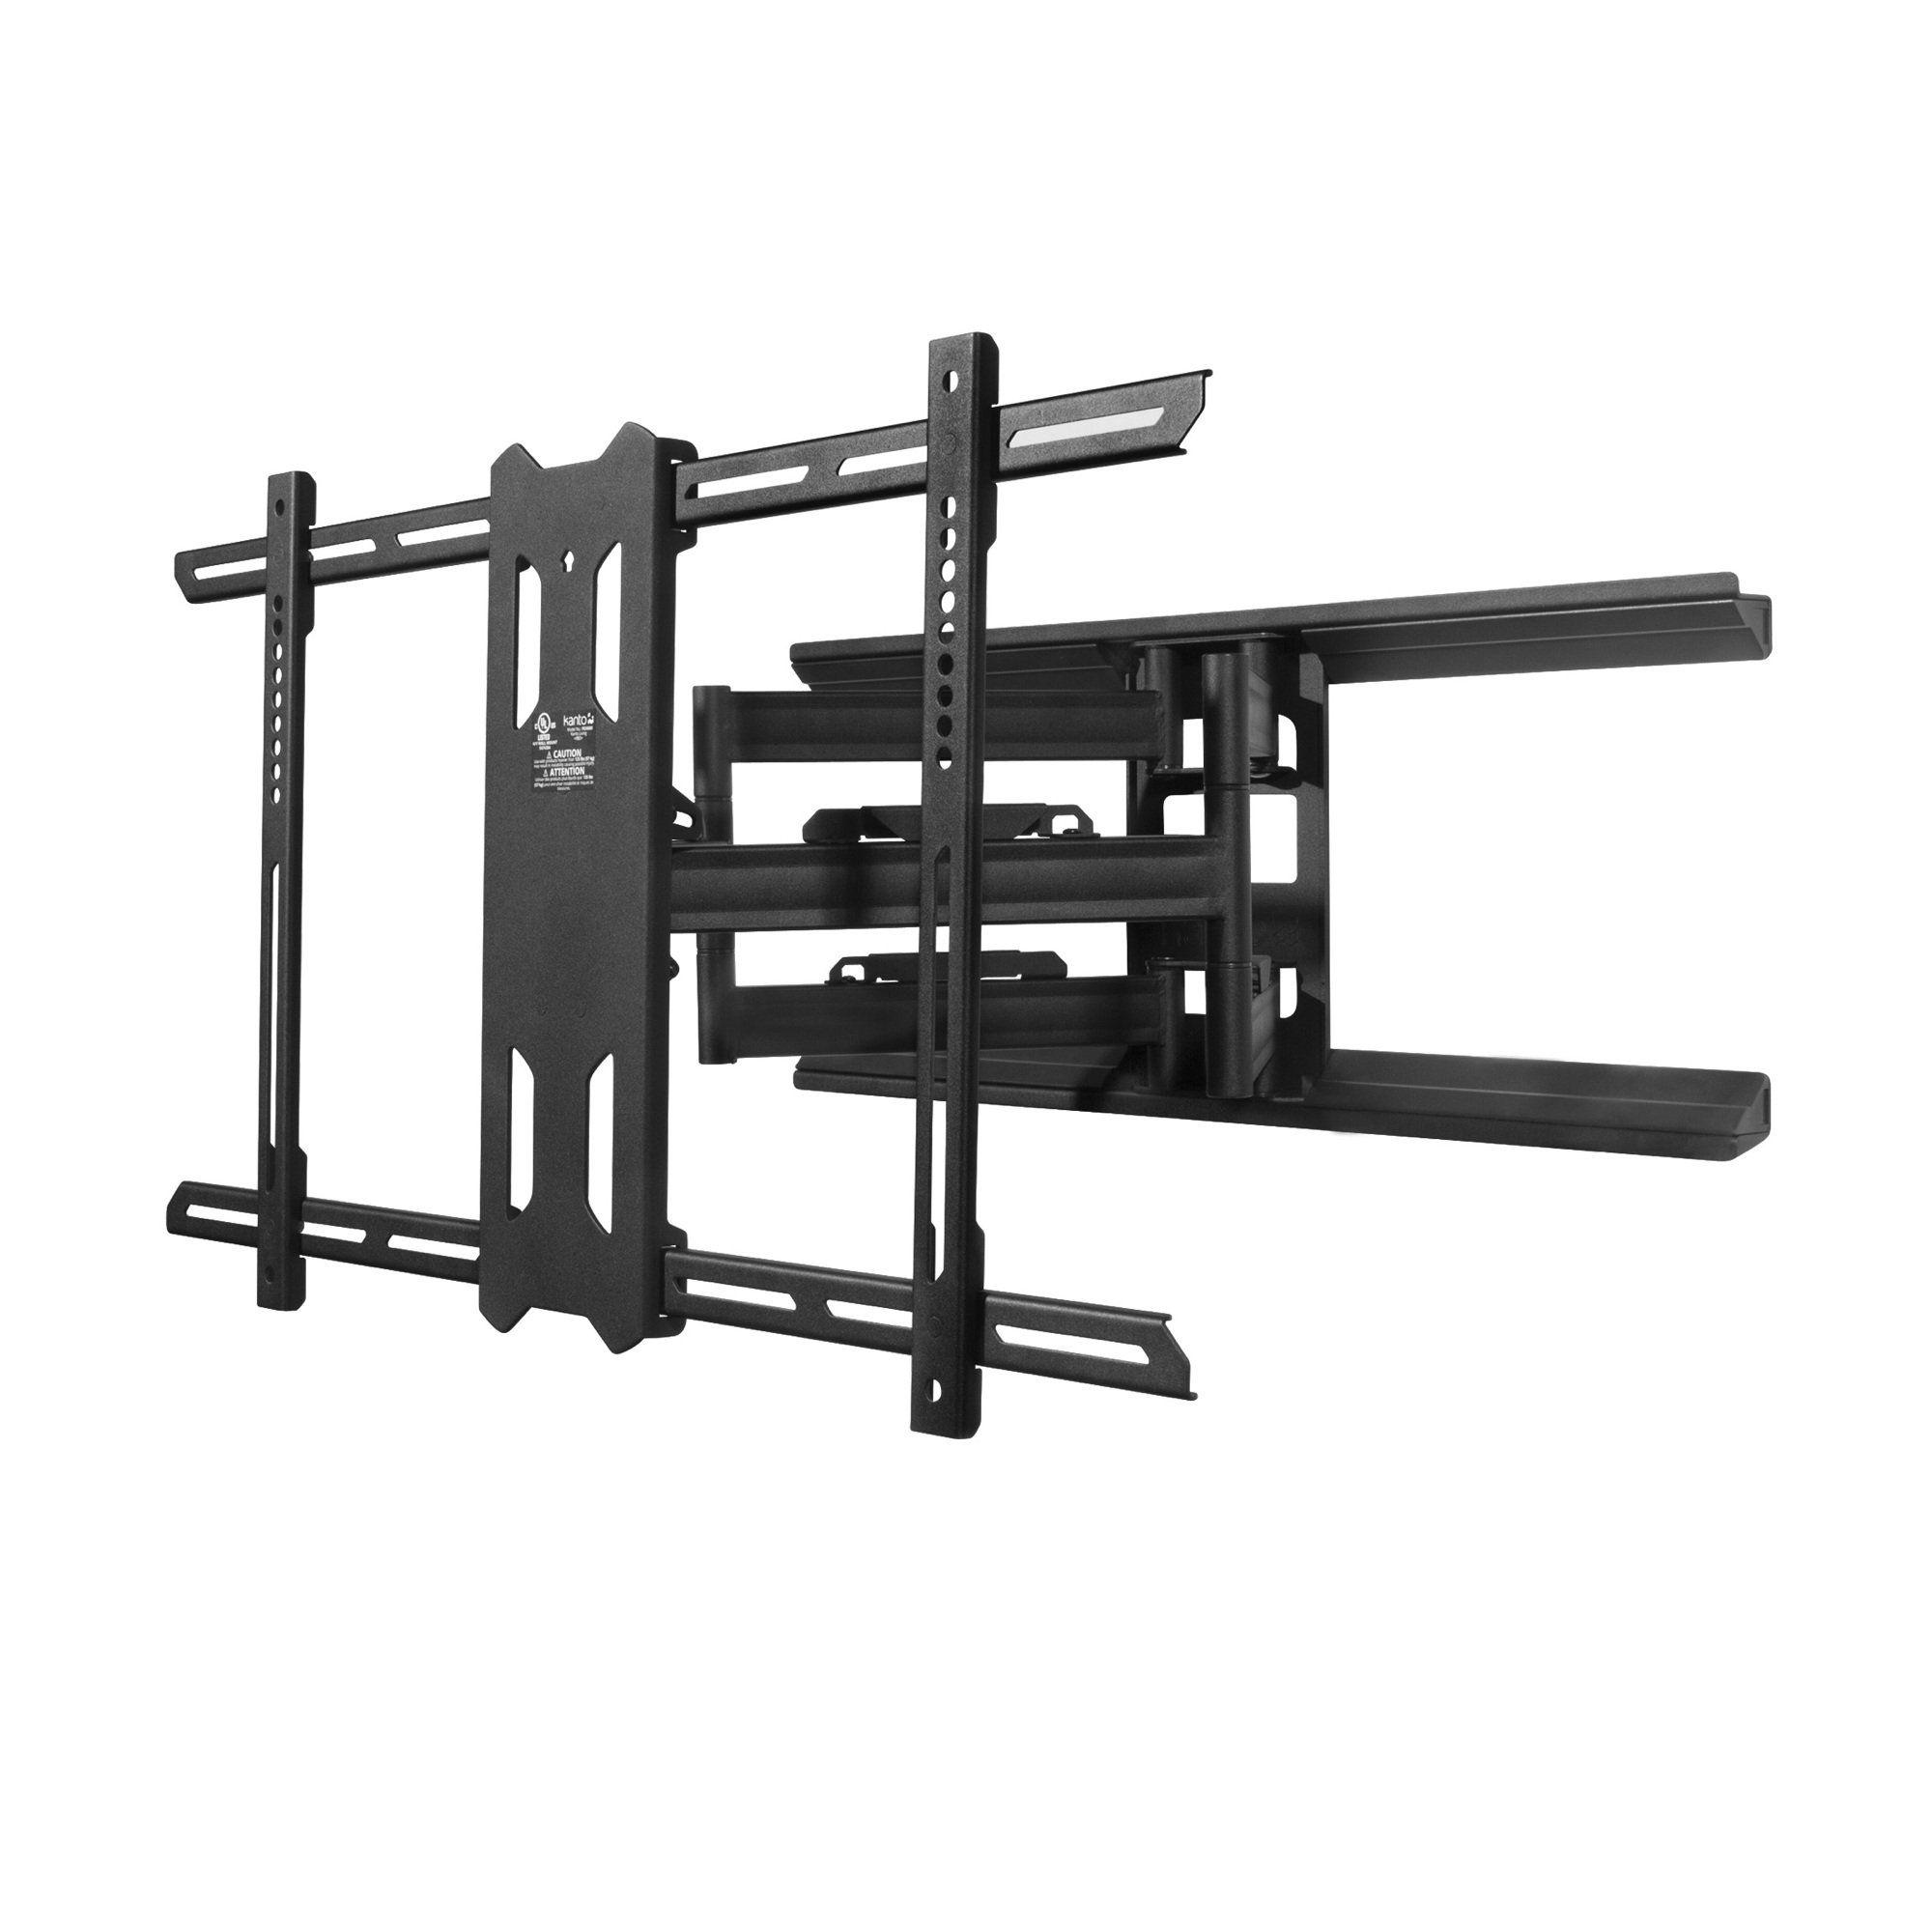 Kanto pdx fullmotion tv wall mount for uuu flatscreen